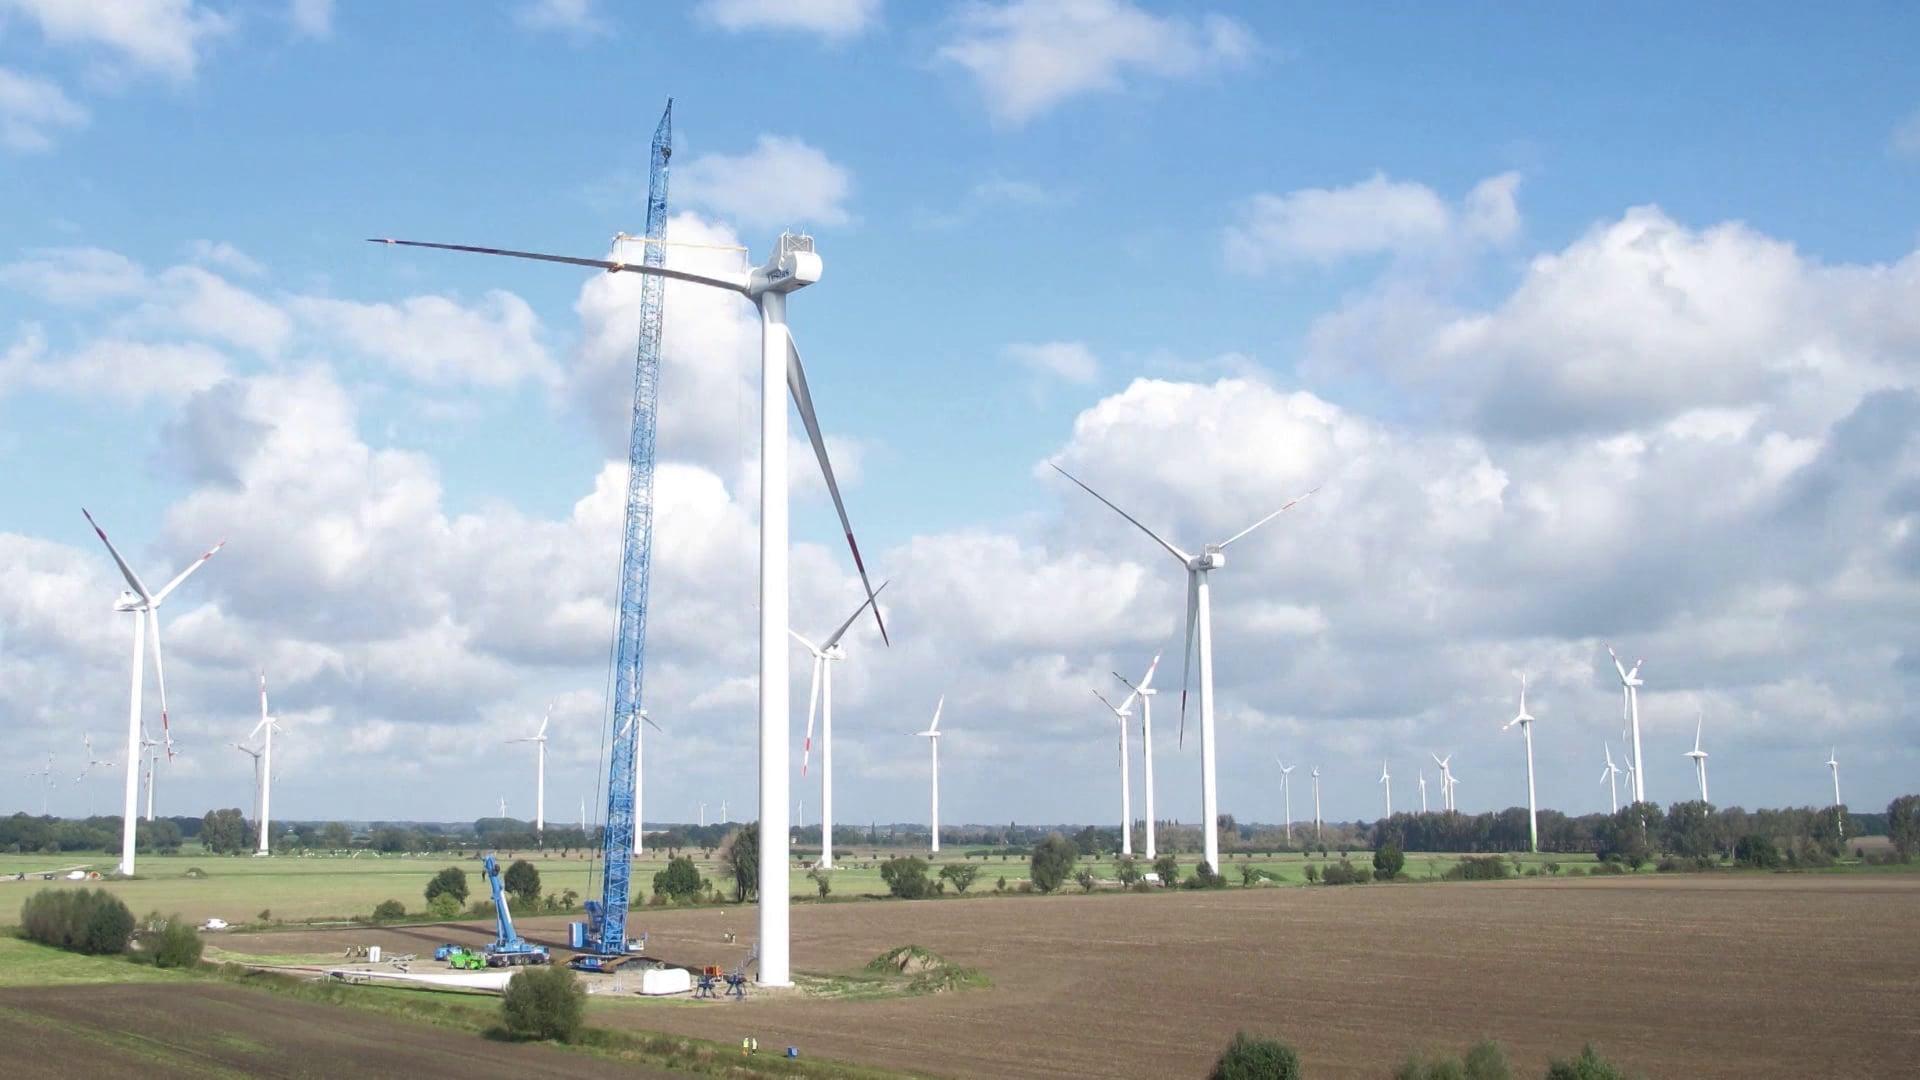 Timelapse of wind turbine installation in Lindtorf